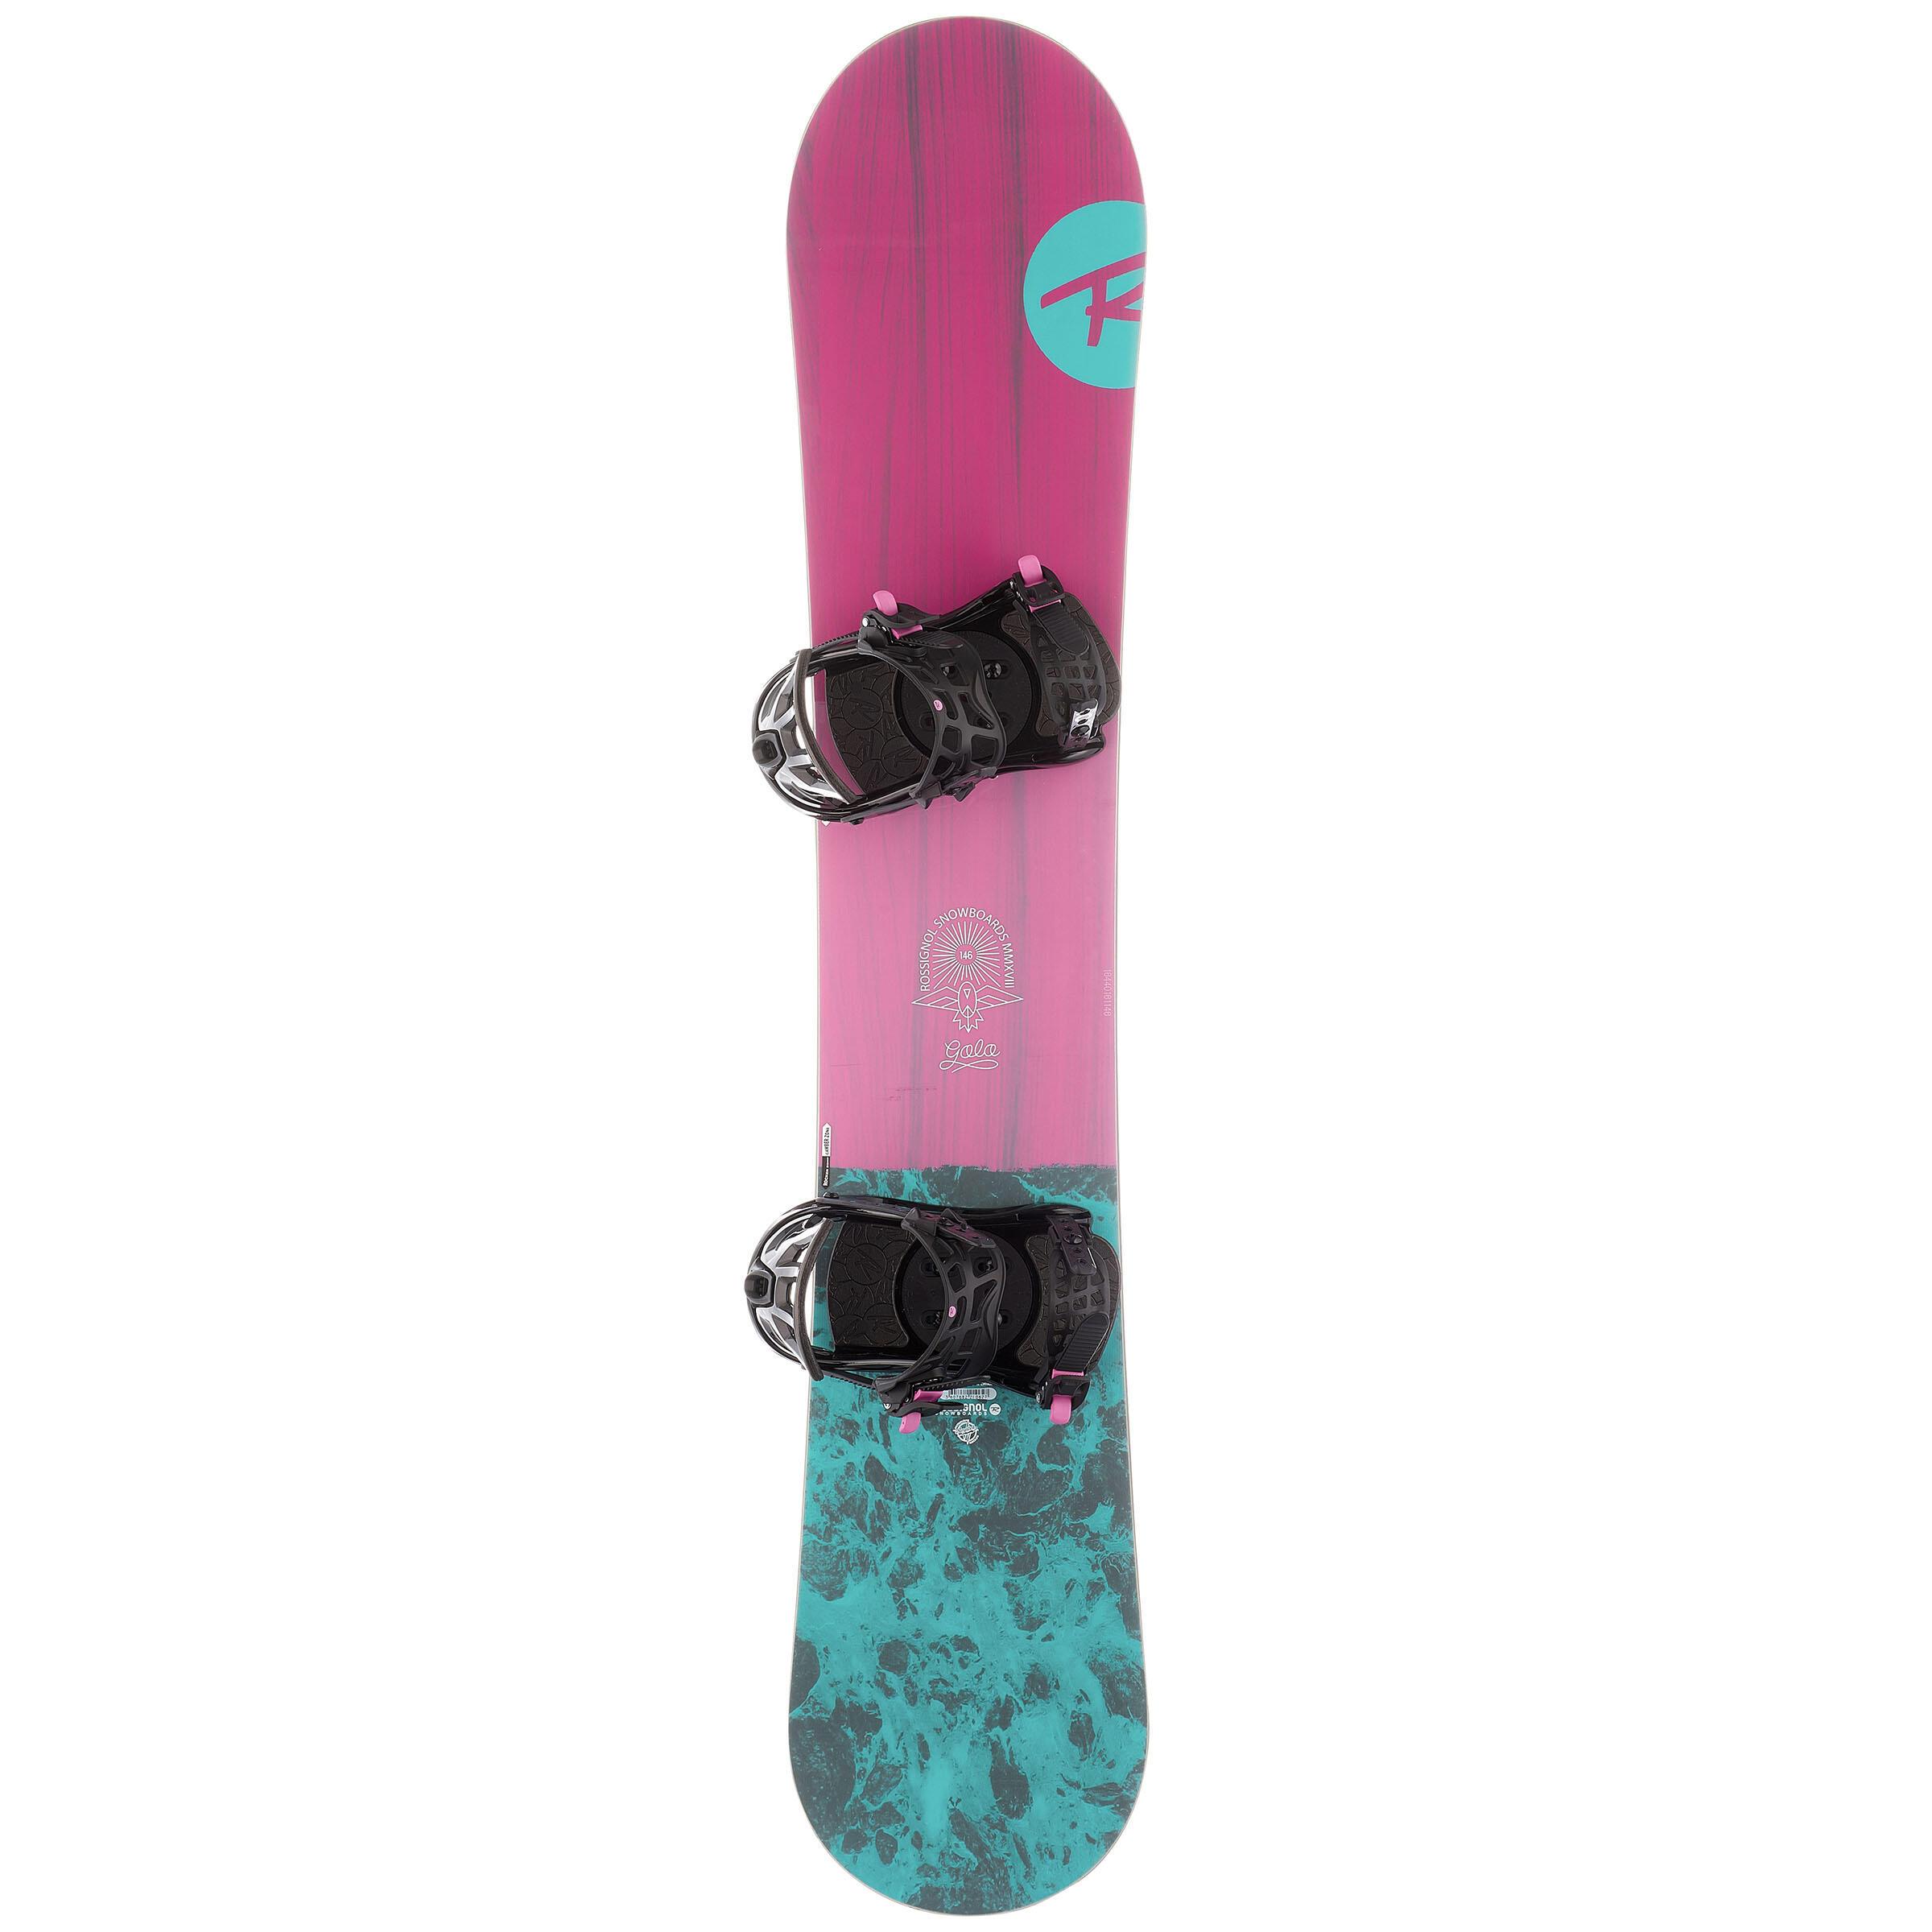 Rossignol Snowboardset All Mountain dames Gala roze/blauw